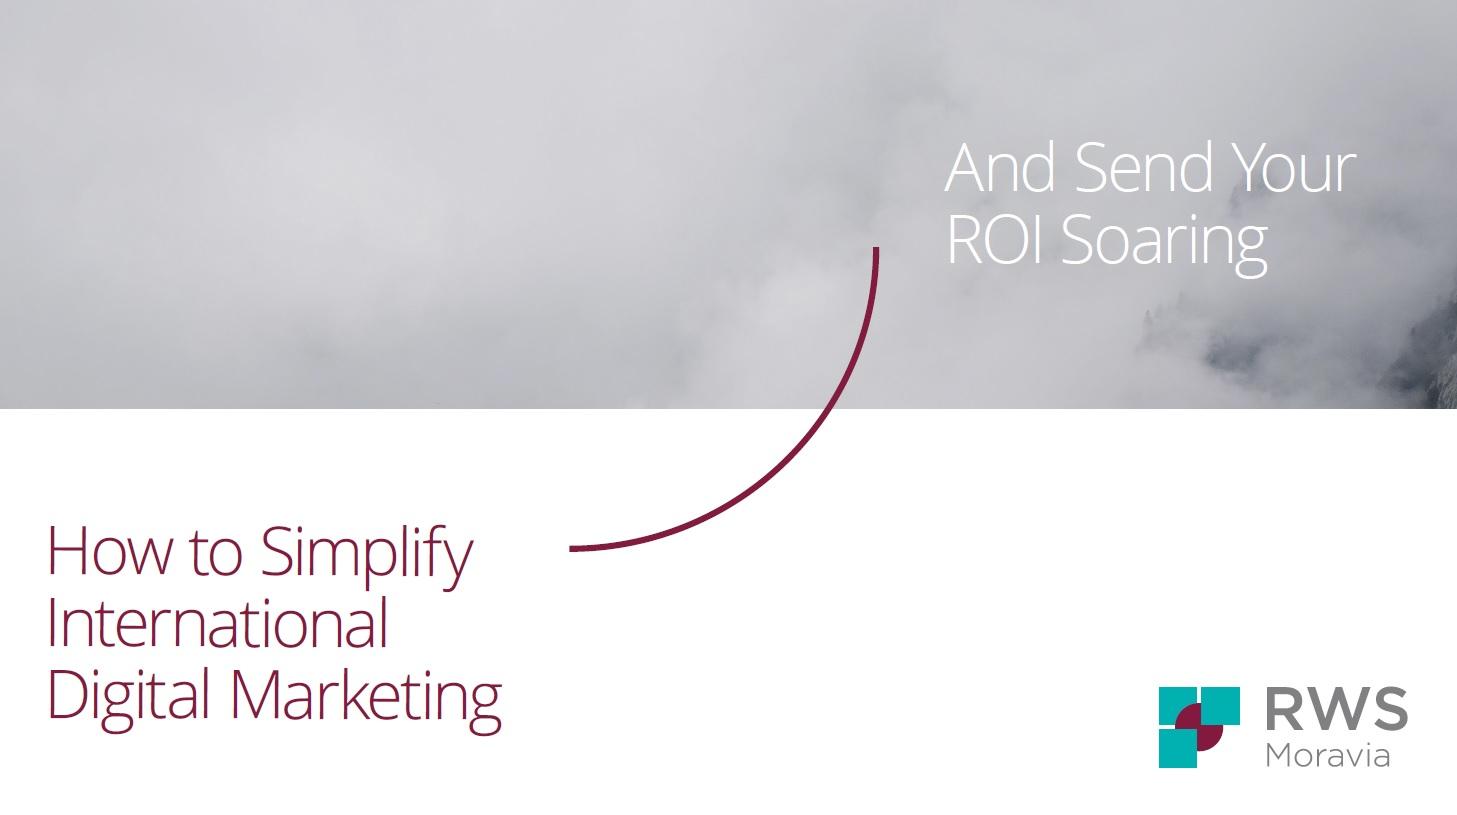 How to Simplify International Digital Marketing Cover